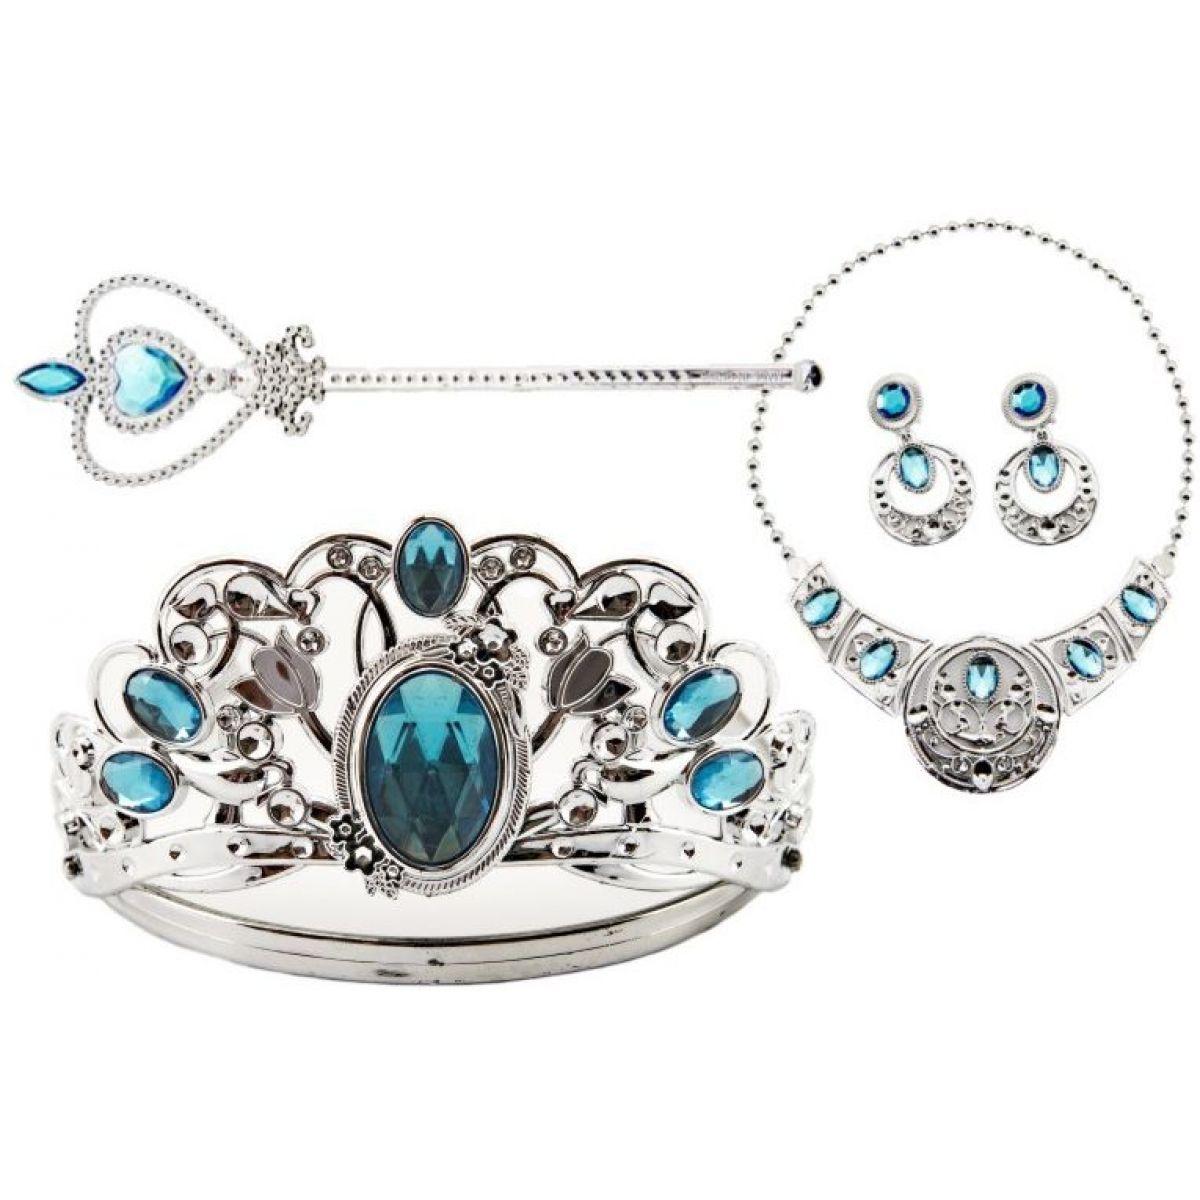 Sada krásy veľká s plastovou korunkou a náhrdelníkom s náušnicami